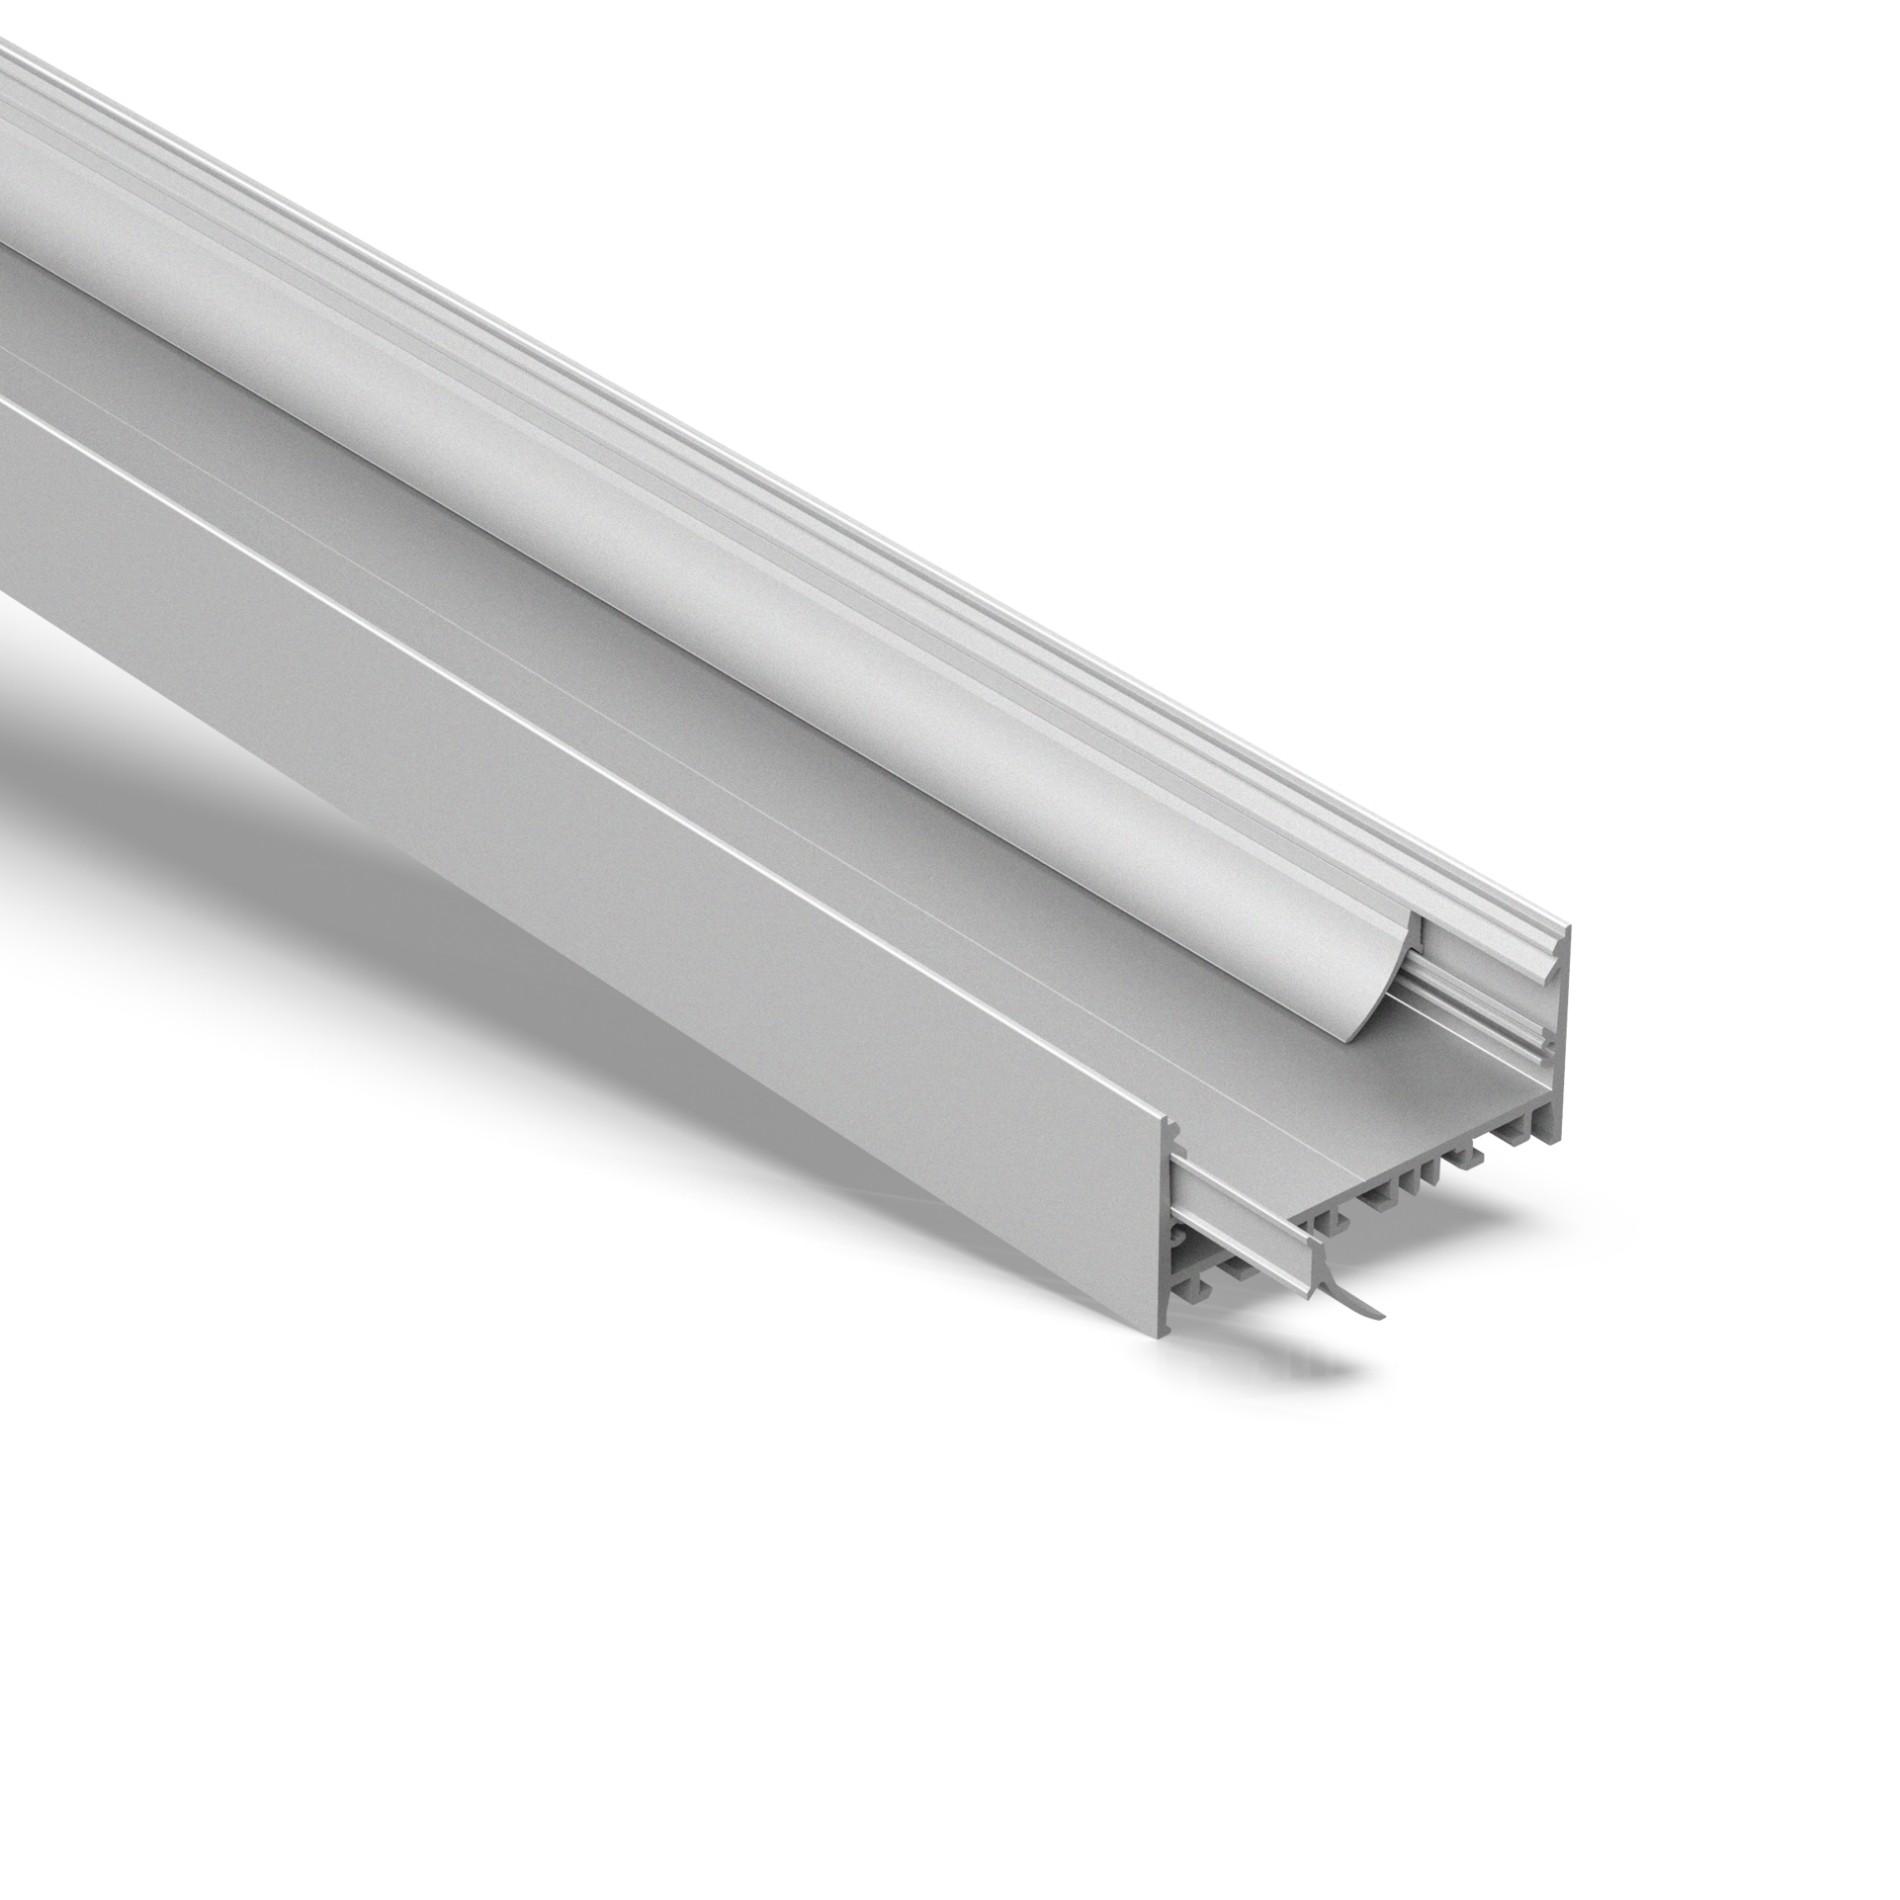 EU80 80mm U shaped square led profile 80x52.5mm